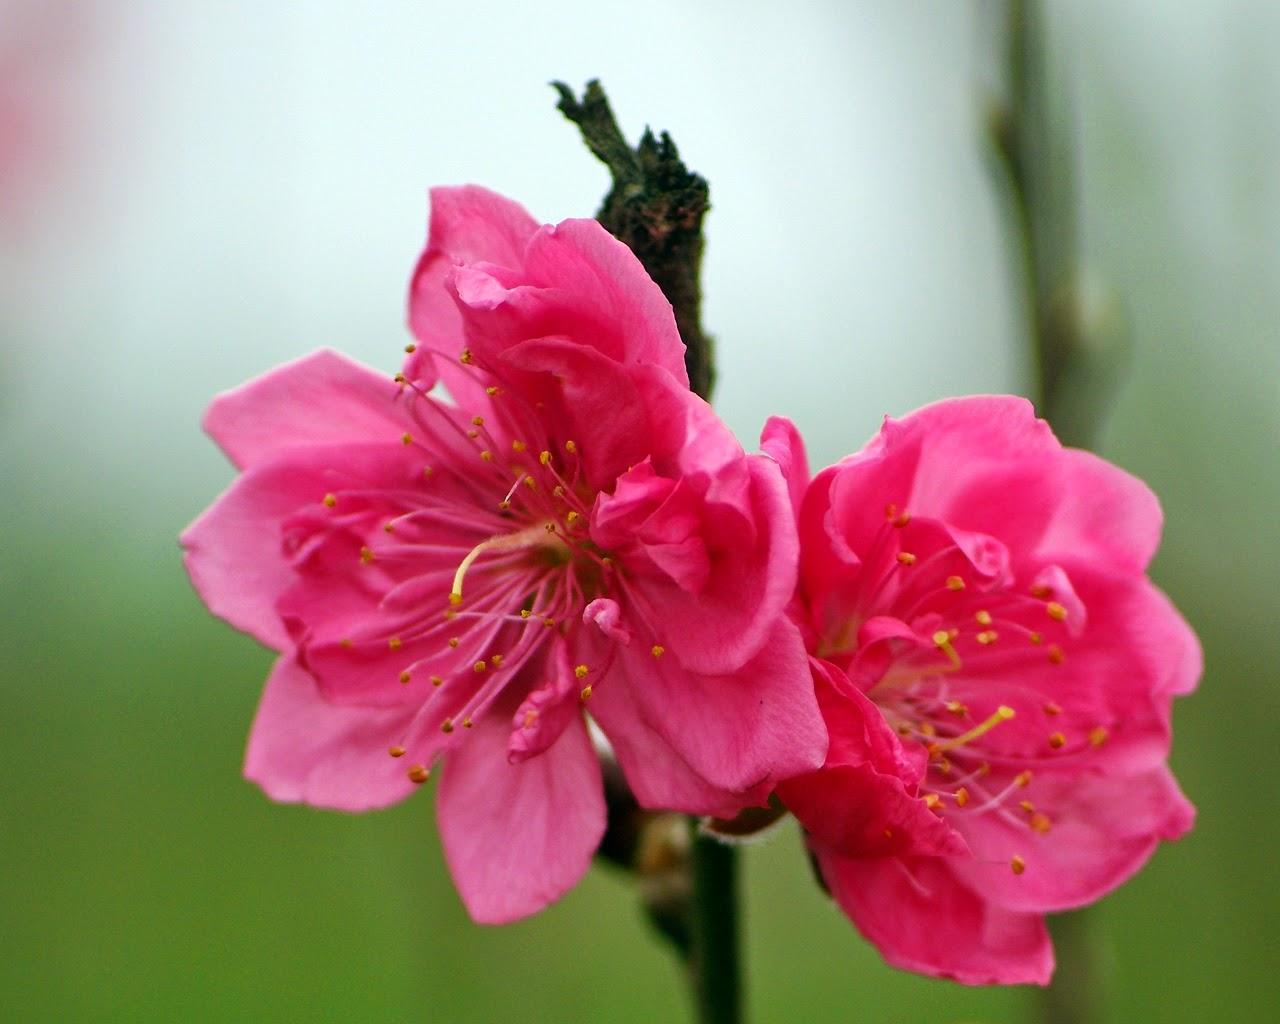 hinh nen hoa dao dep nhat